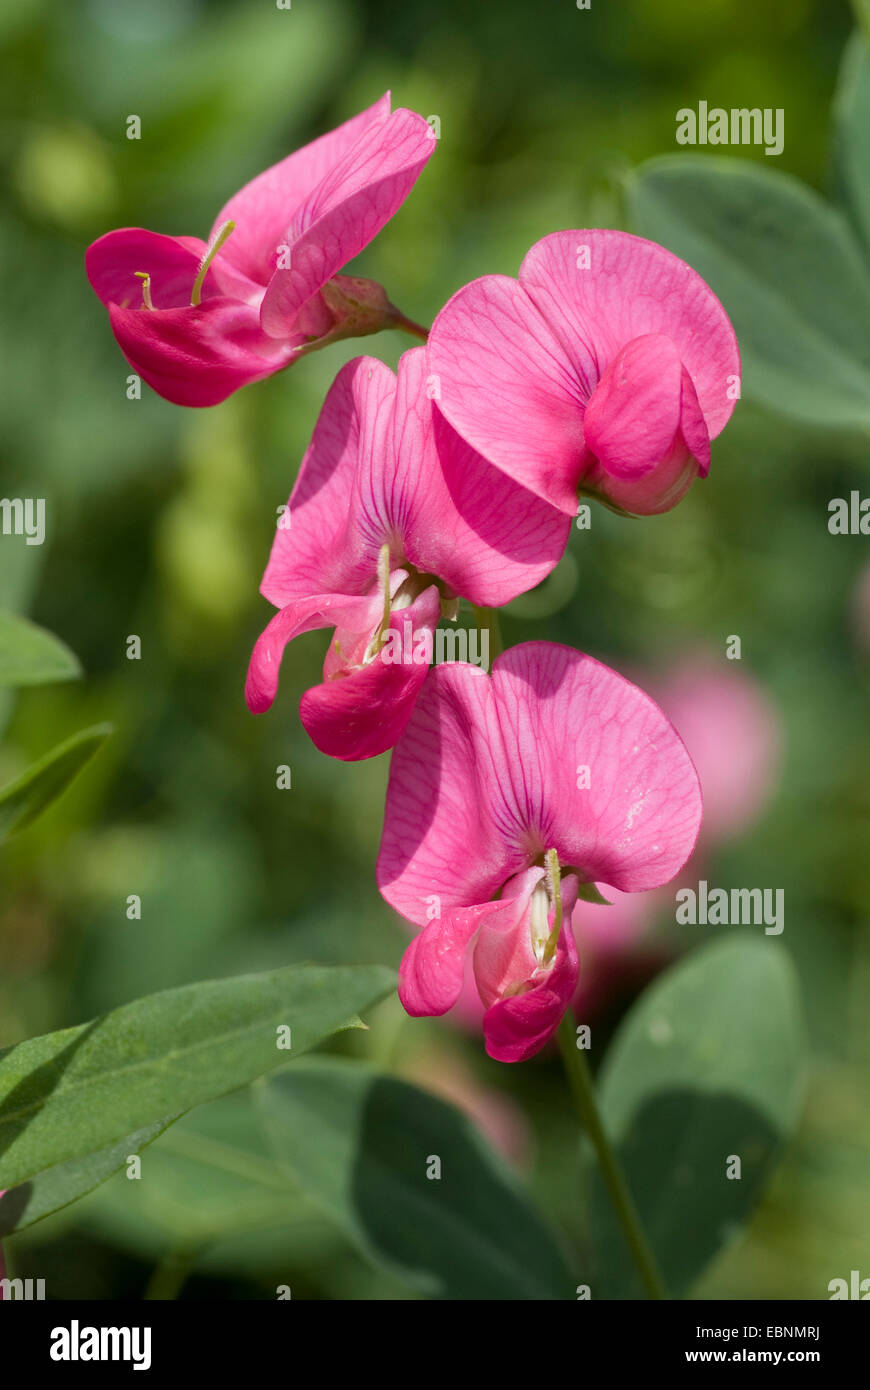 earth-nut peavine, tuberous vetchling, tuberous pea (Lathyrus tuberosus), blooming, Germany - Stock Image